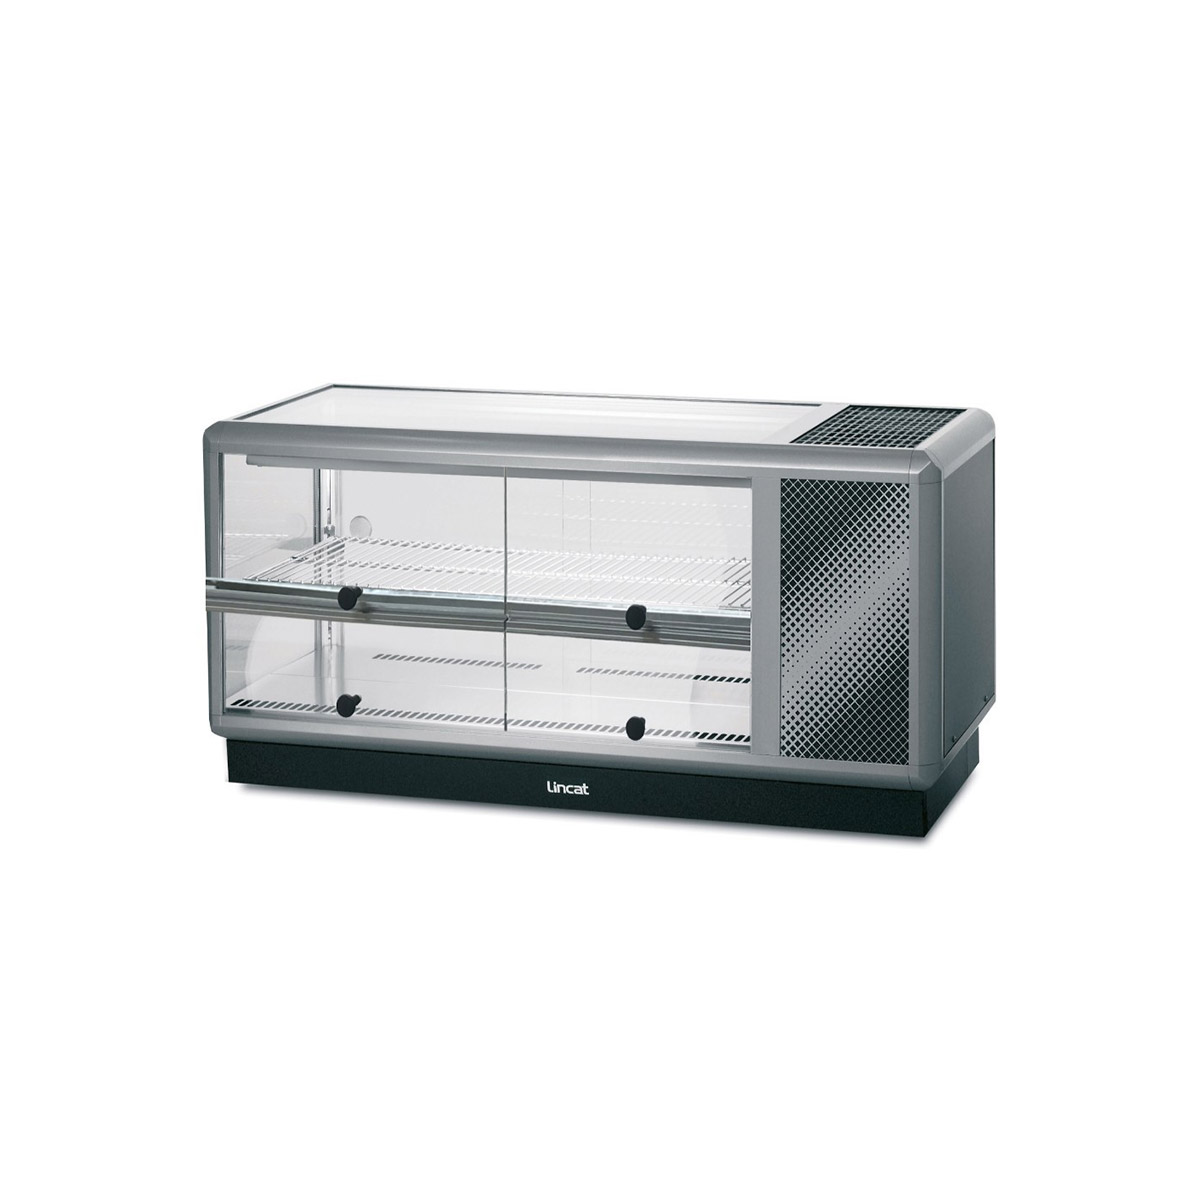 D5R/125S - Lincat Seal 500 Series Counter-top Refrigerated Merchandiser - Self-Service - W 1250 mm - 0.6 kW